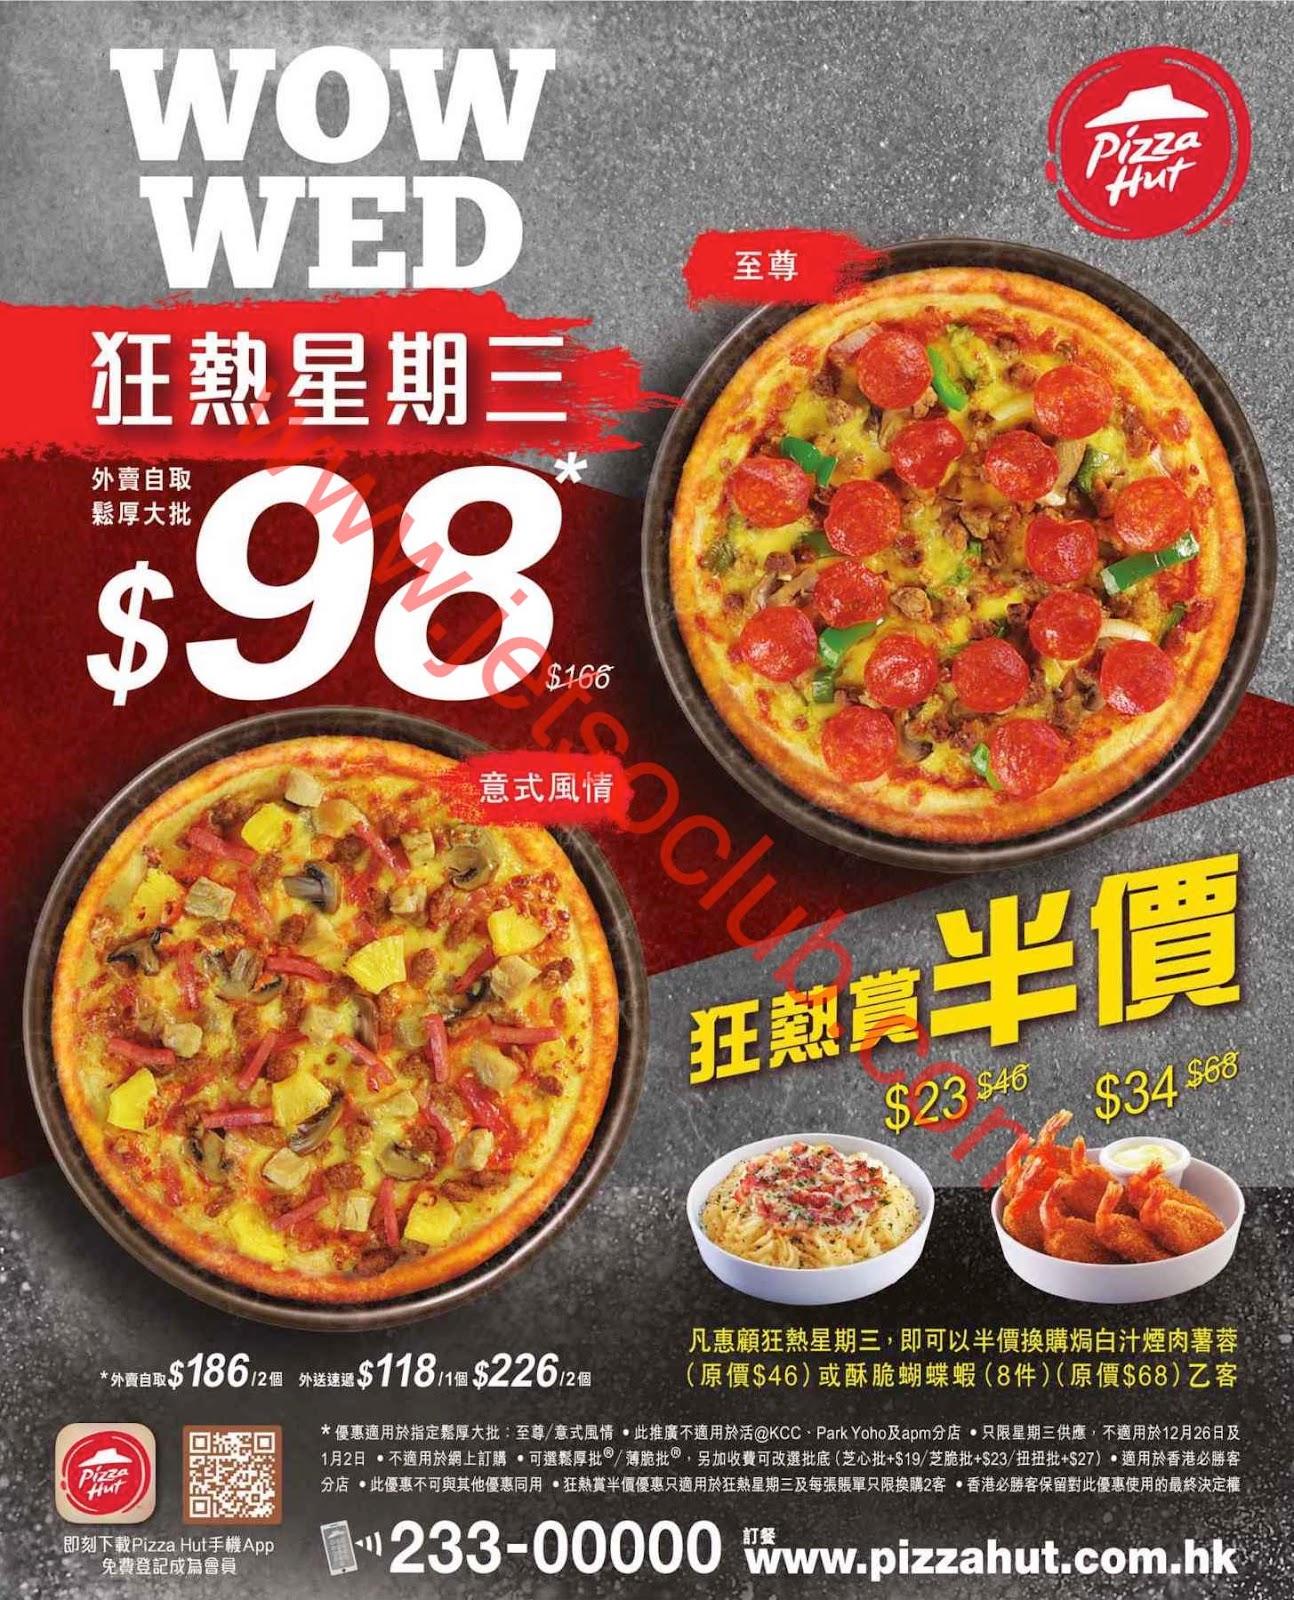 Pizza Hut:狂熱星期三 外賣大批 $98 / 狂熱賞半價(星期三) ( Jetso Club 著數俱樂部 )